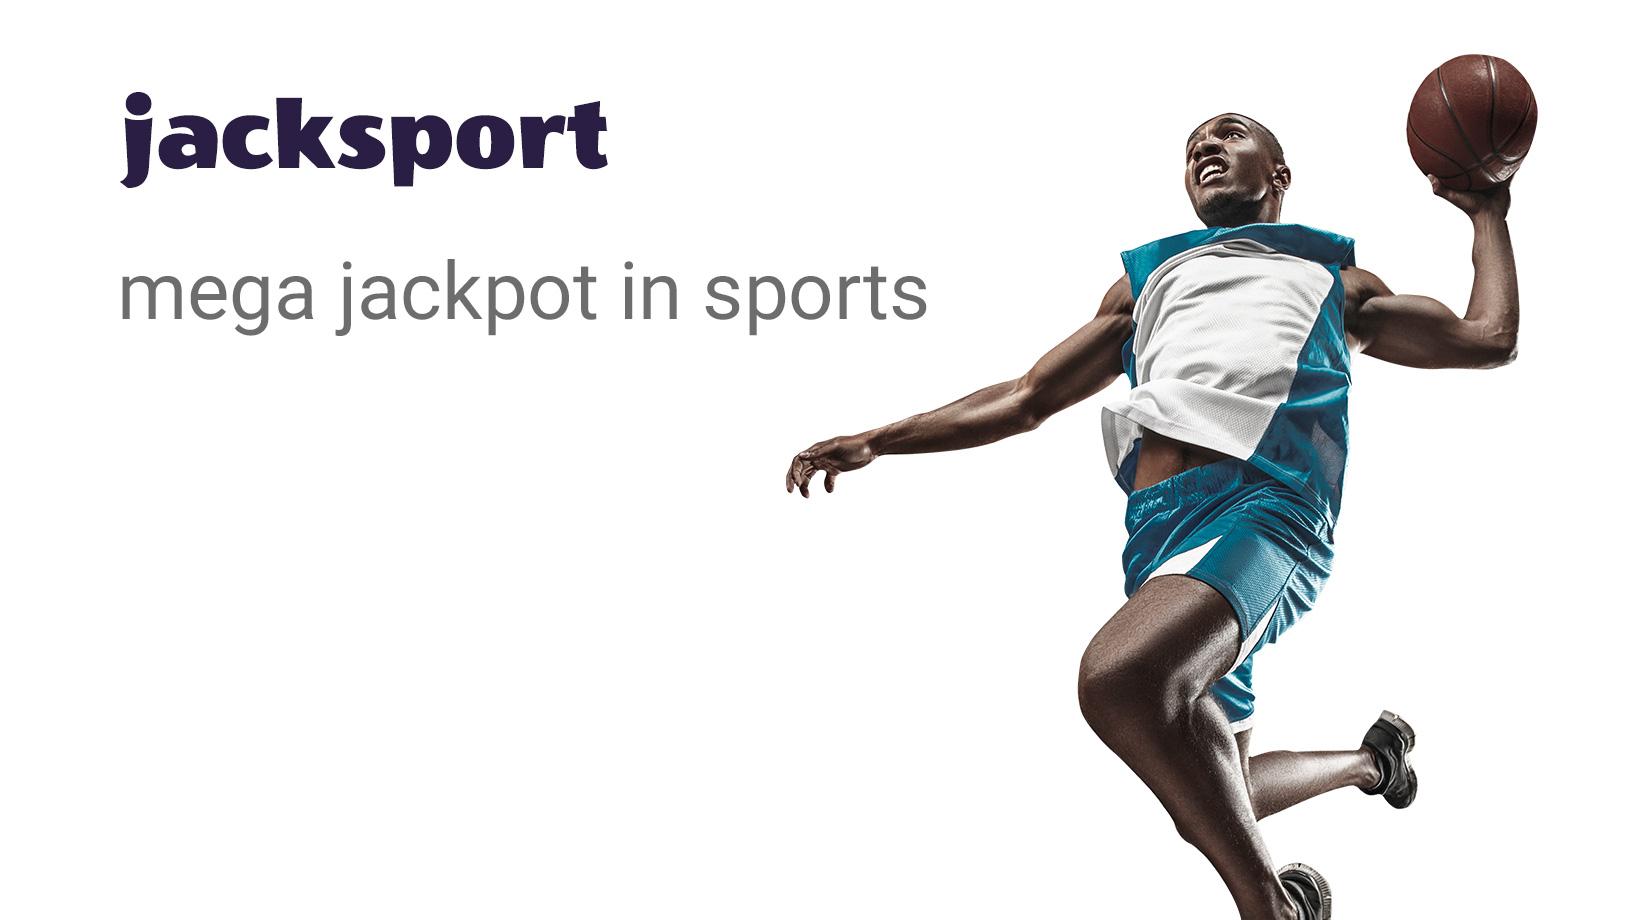 Jacksport mega jackpot in sports